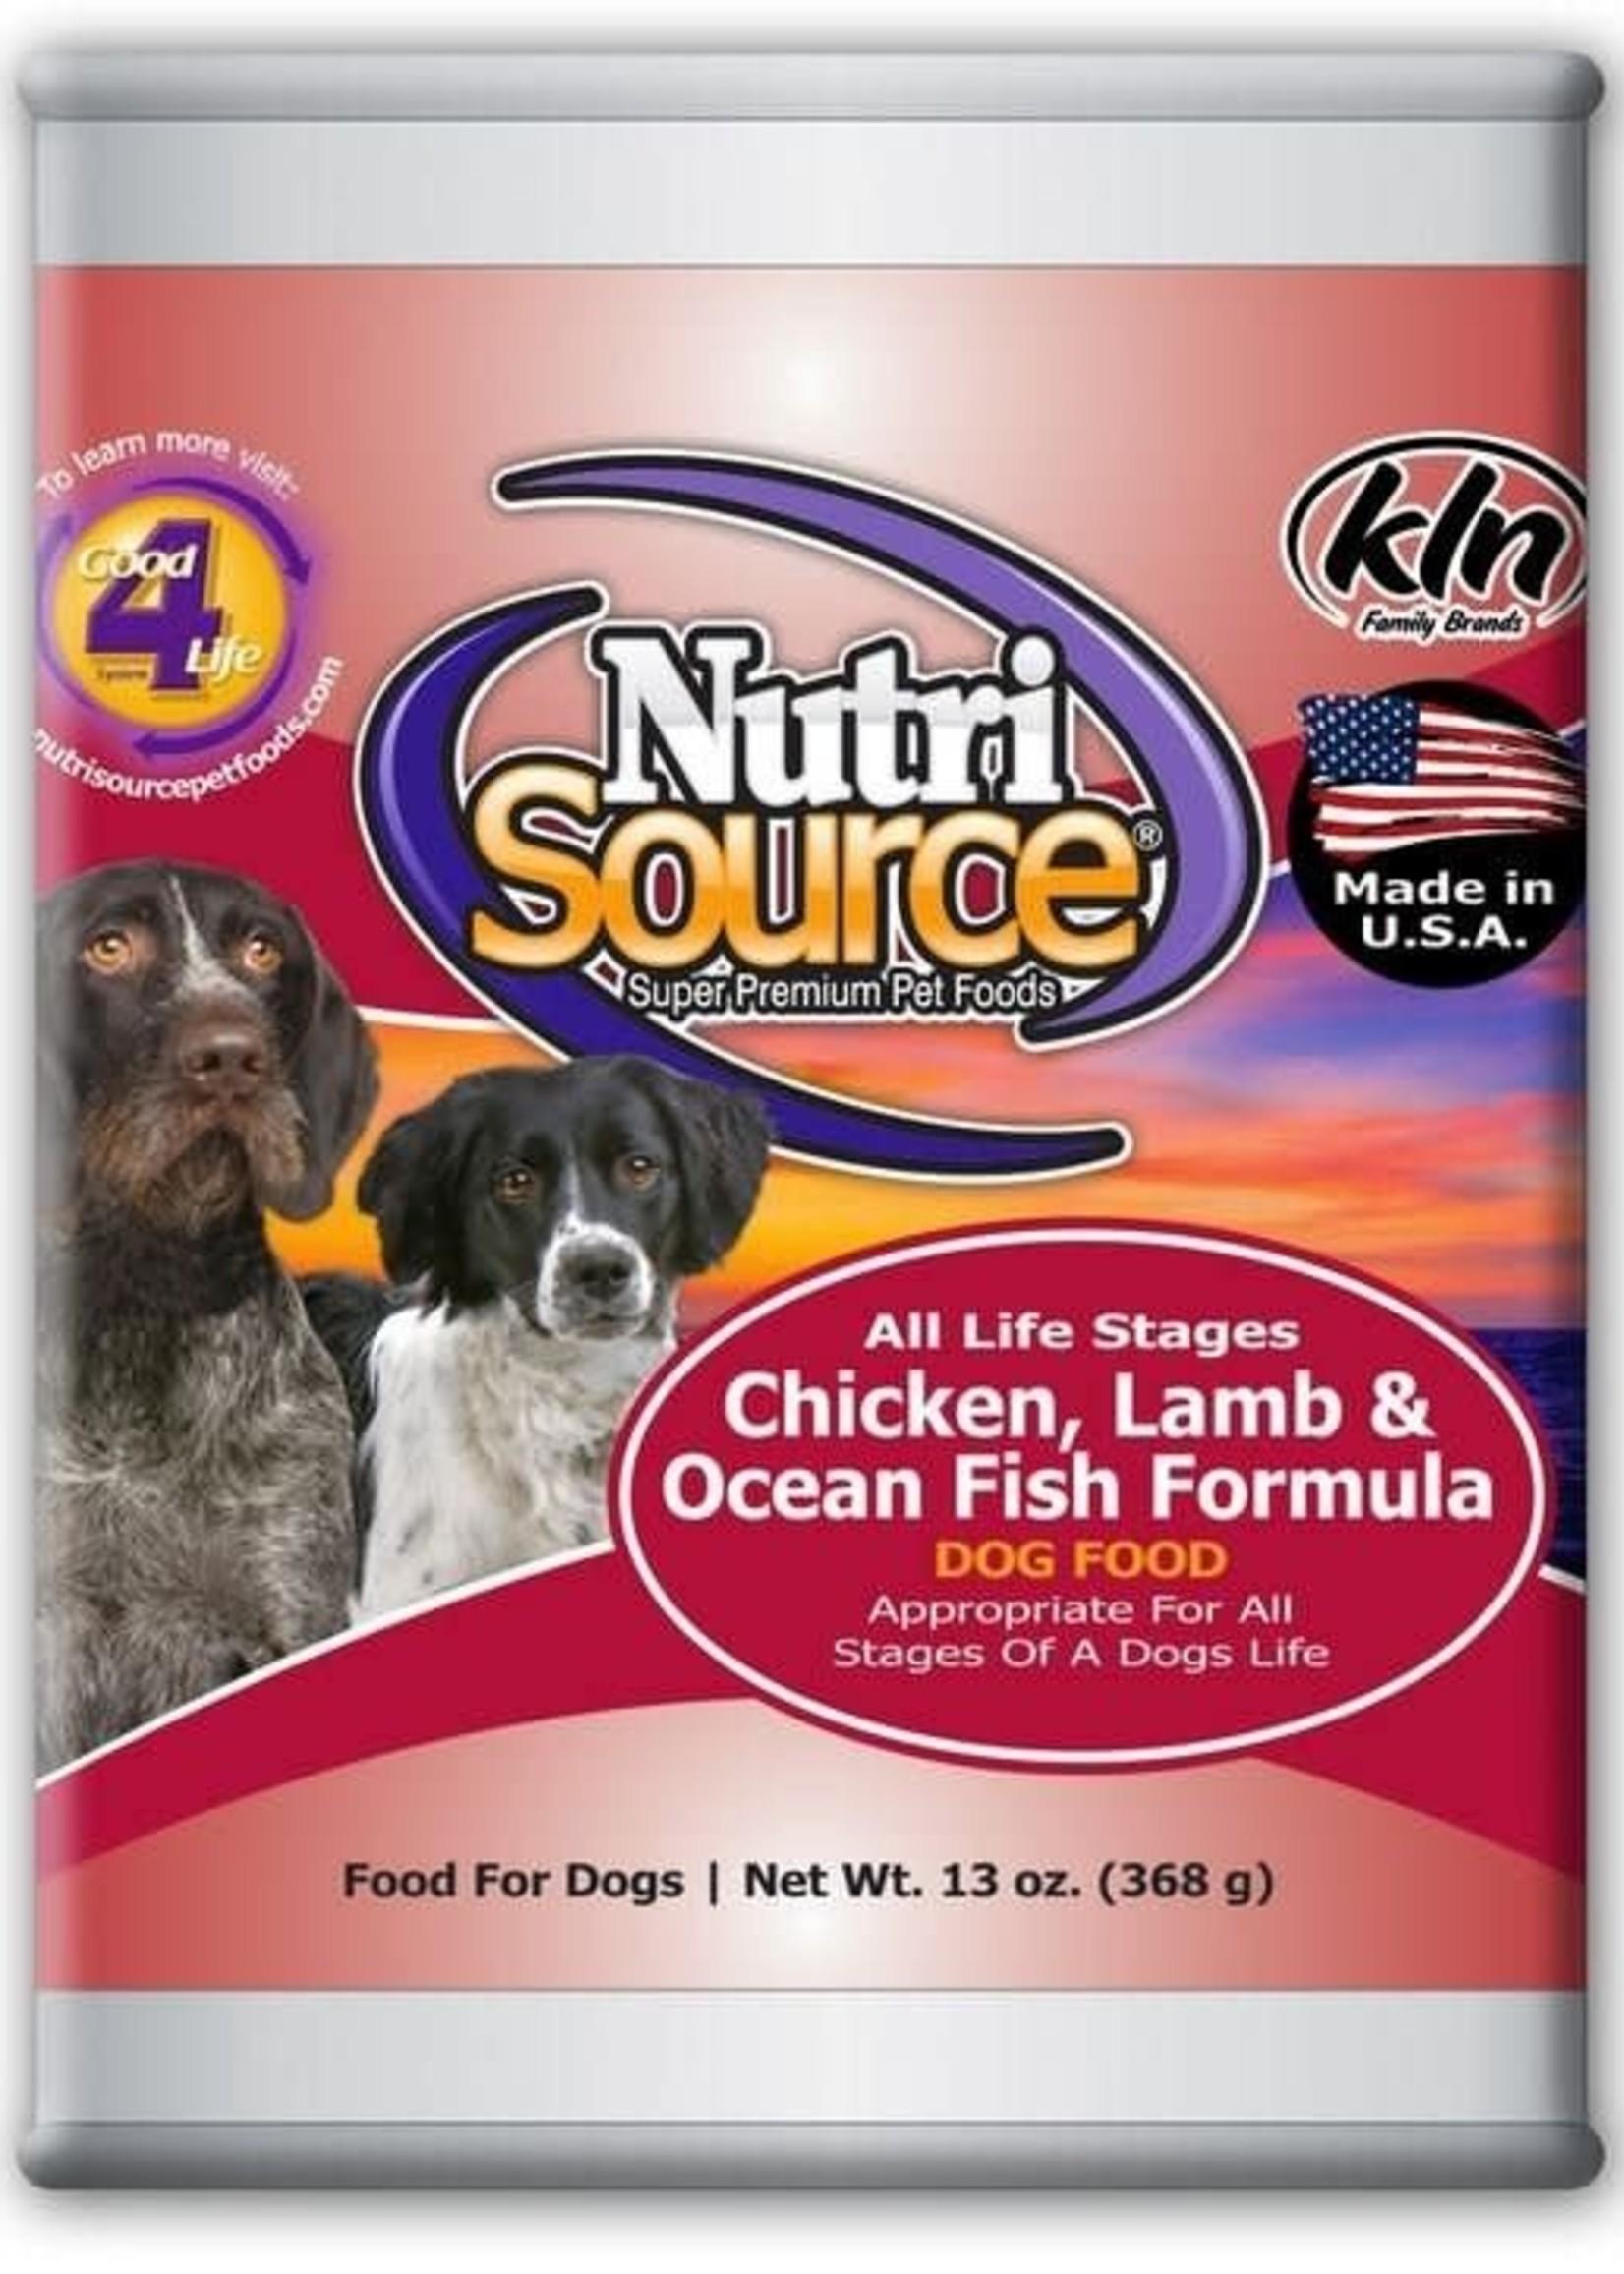 Nutrisource NutriSource Chicken, Lamb & Fish Wet Dog Food 13oz